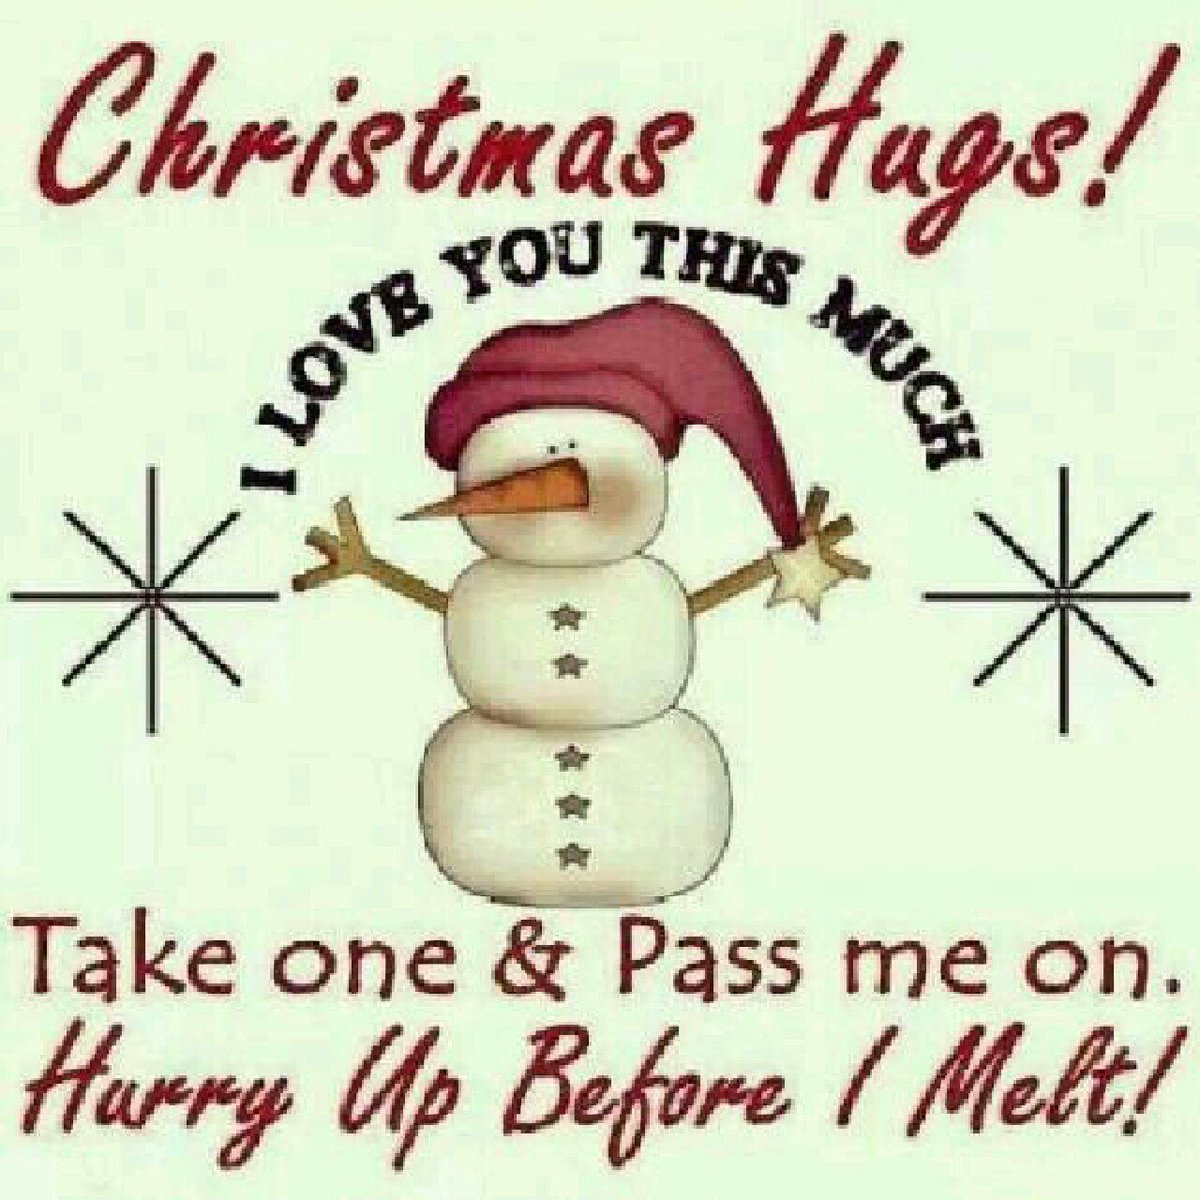 Take one and pass it along!! #Christmas #Hugs https://t.co/4tUmnttTtm